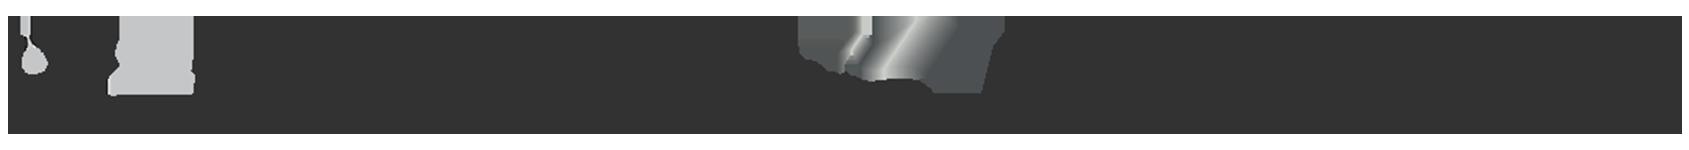 Barra de logos-02-v2